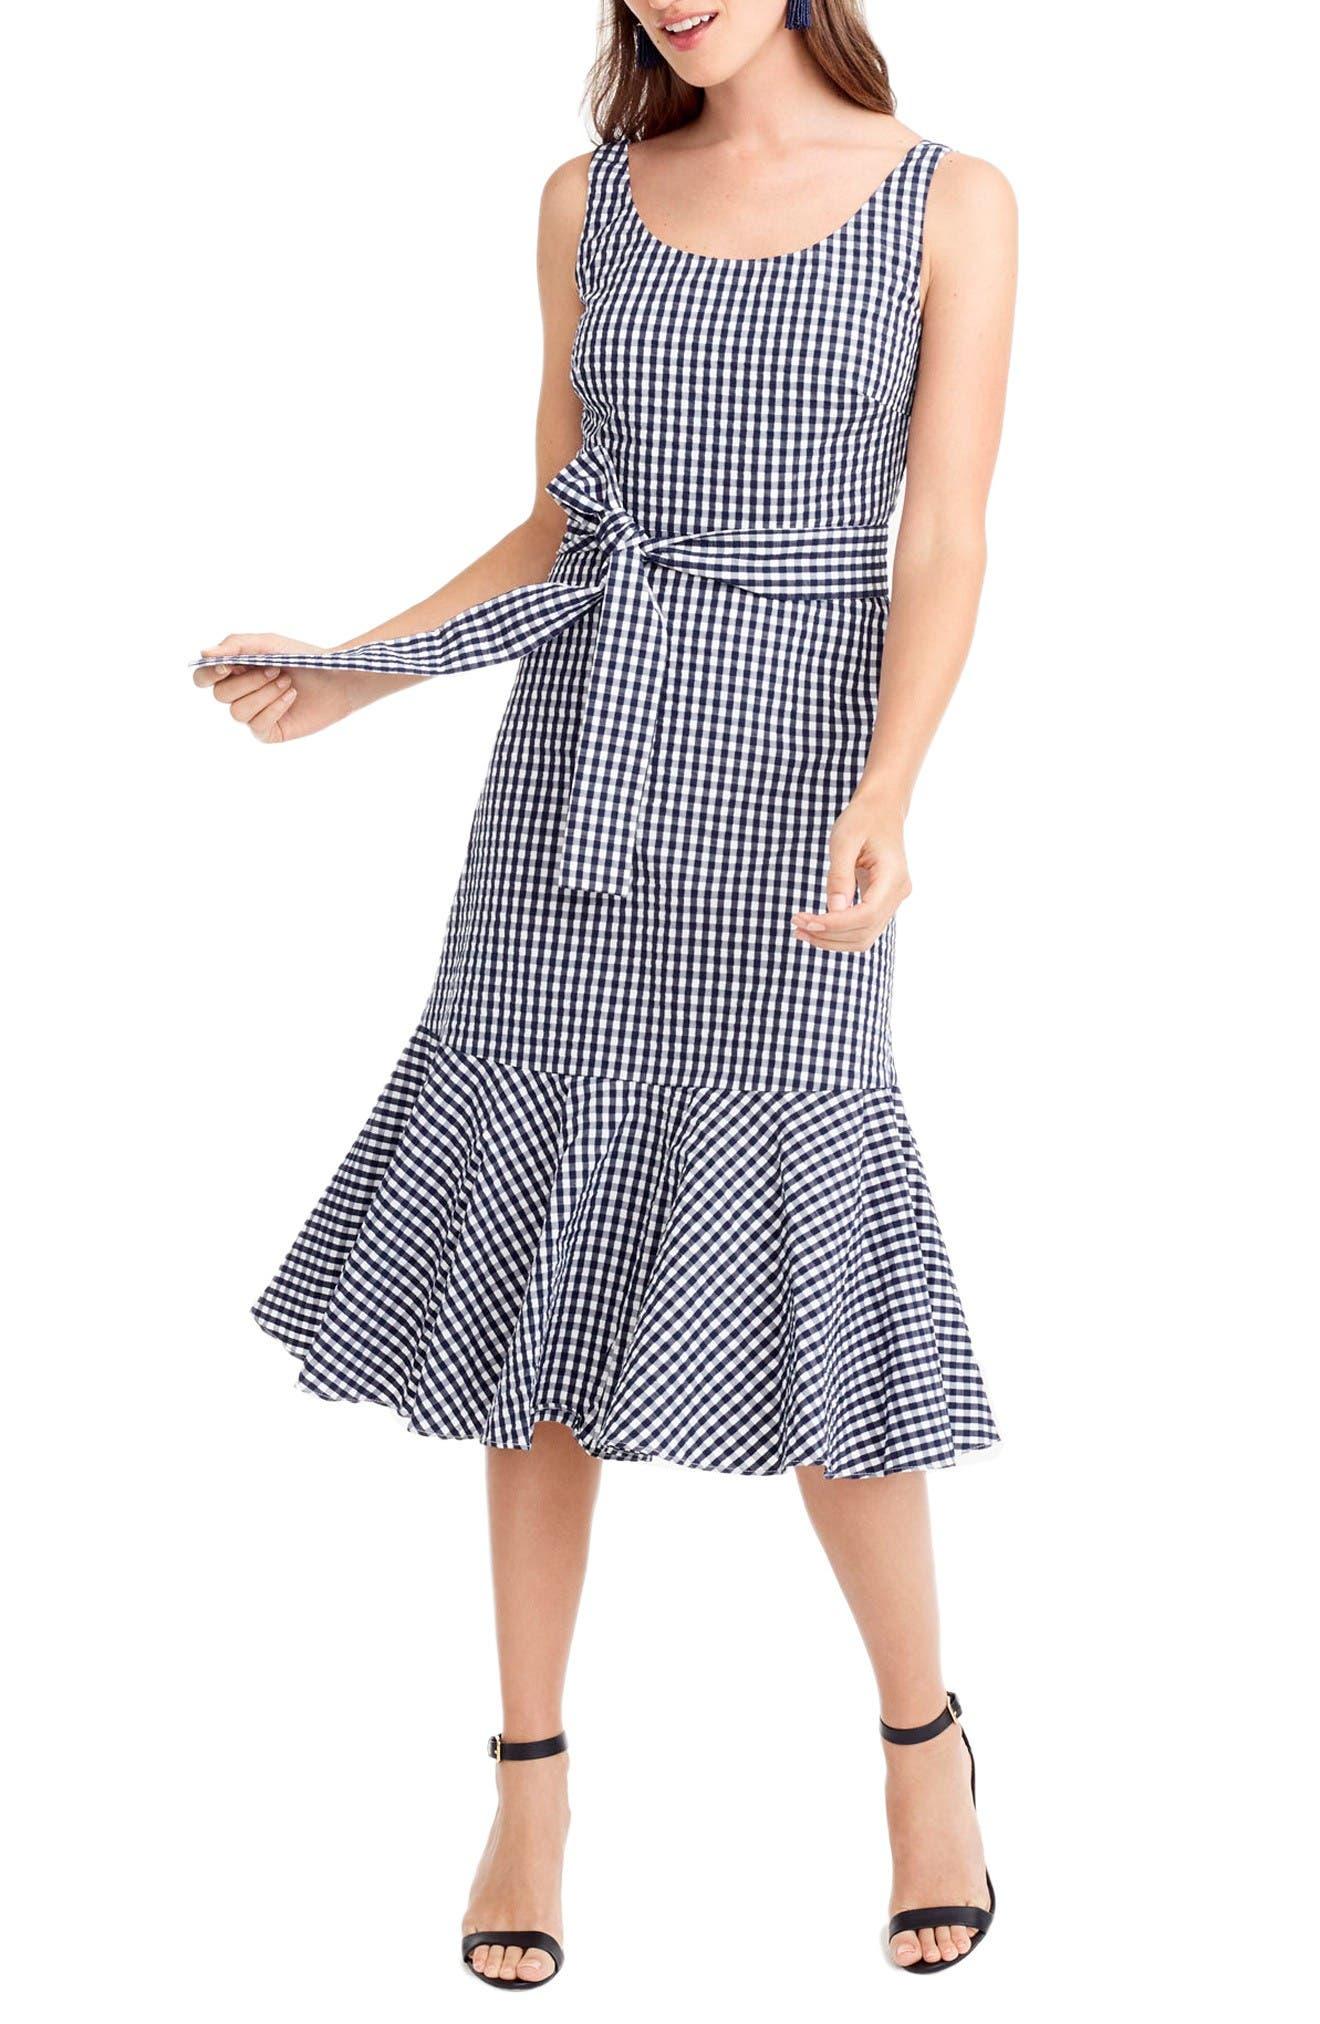 Alternate Image 1 Selected - J.Crew Gingham Ruffle Hem Midi Dress (Regular & Petite)